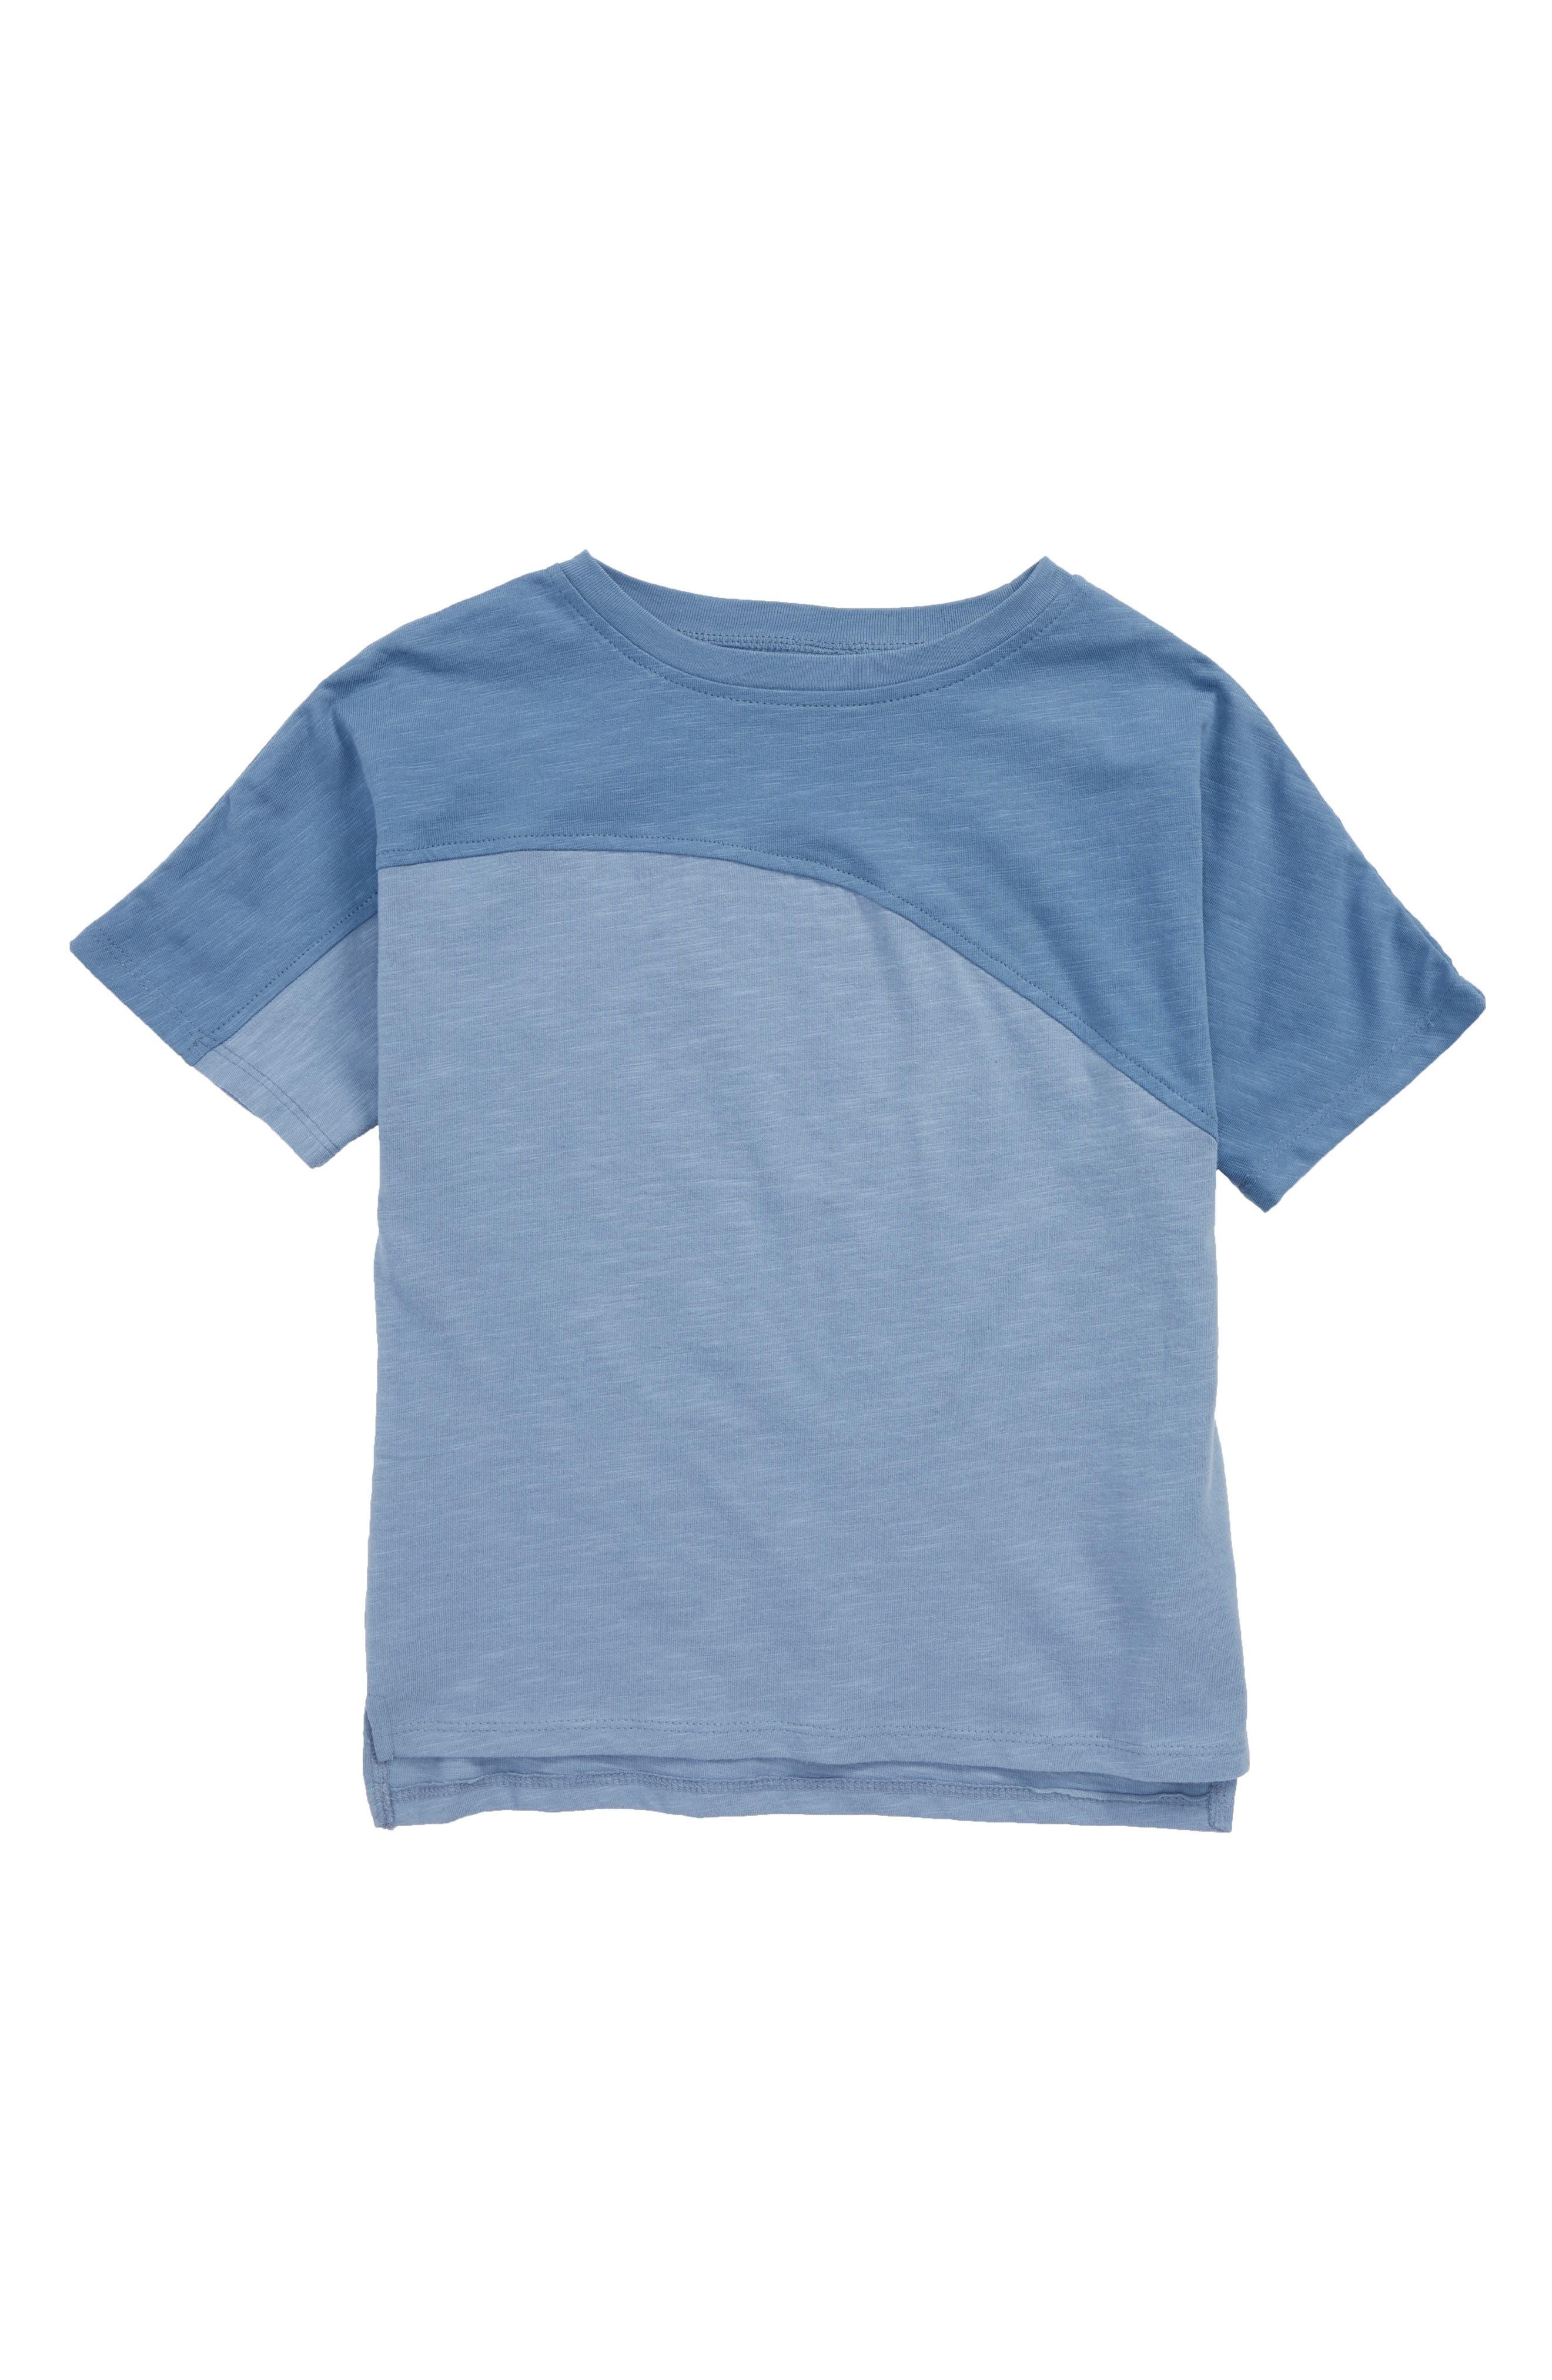 Diagonal Washed T-Shirt,                         Main,                         color, Blue Moonlight- Blue